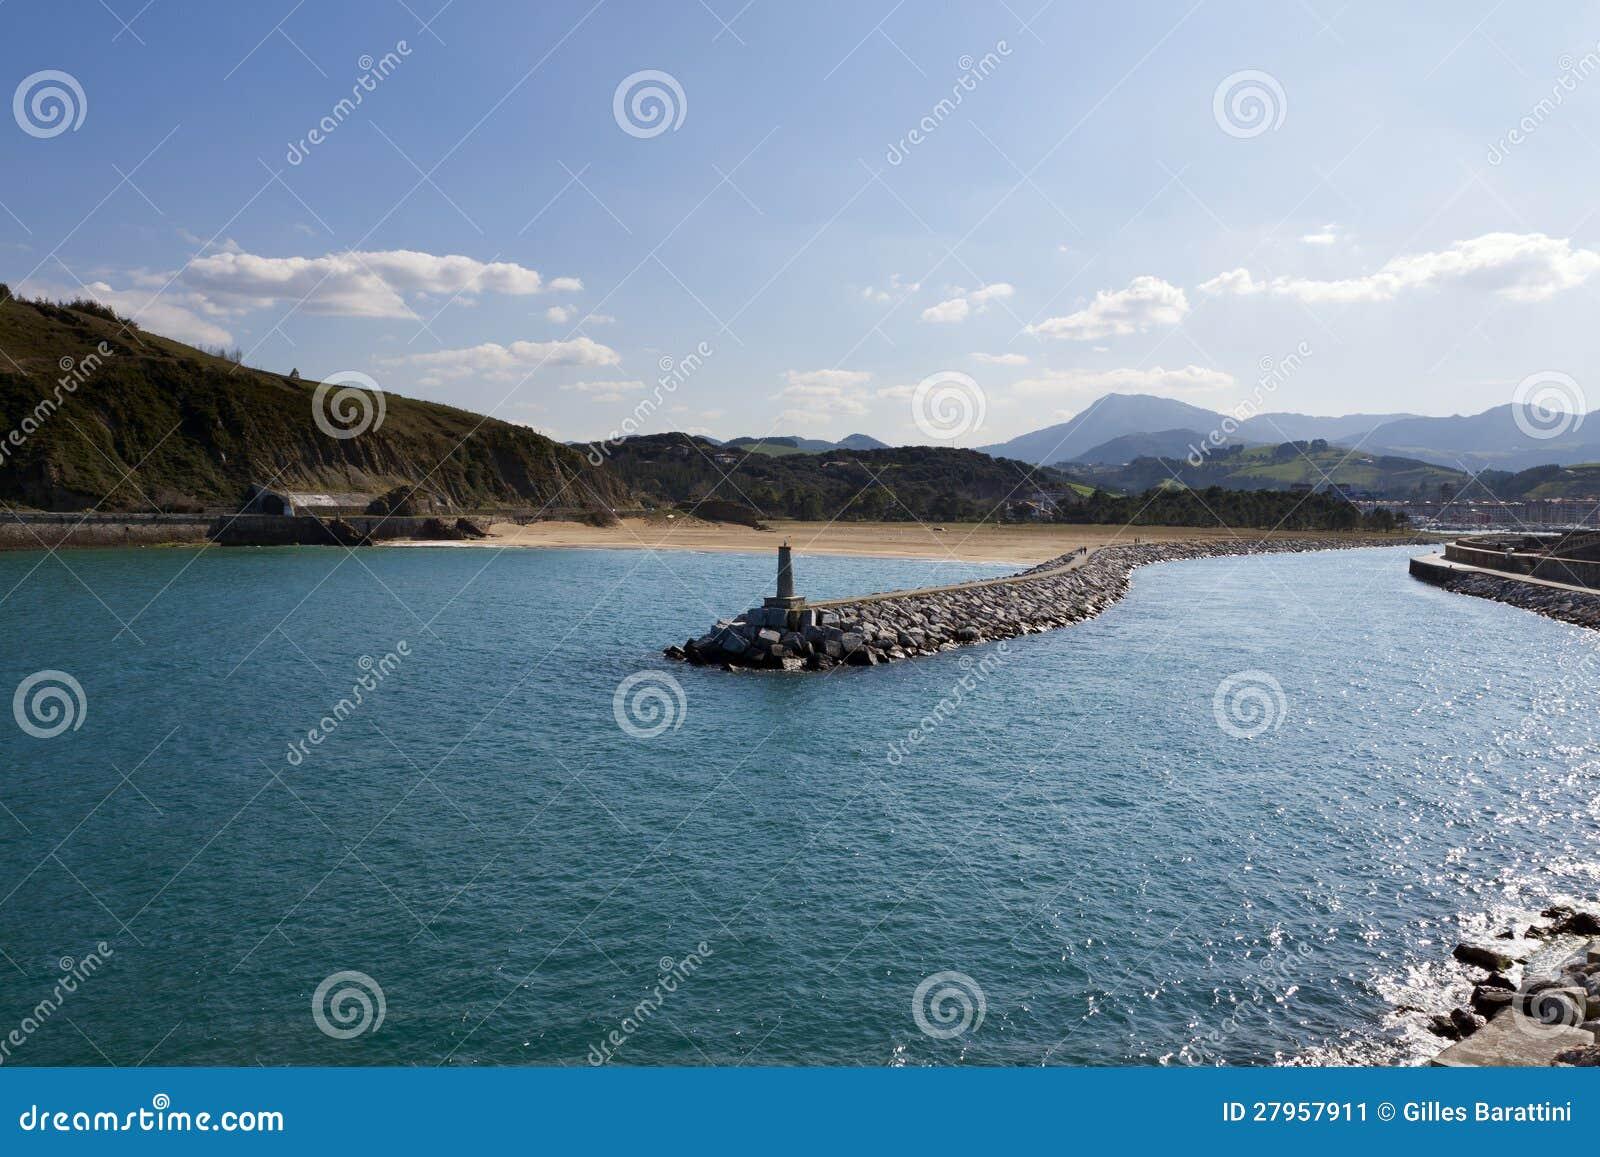 Basque coast of Anglet to Debat